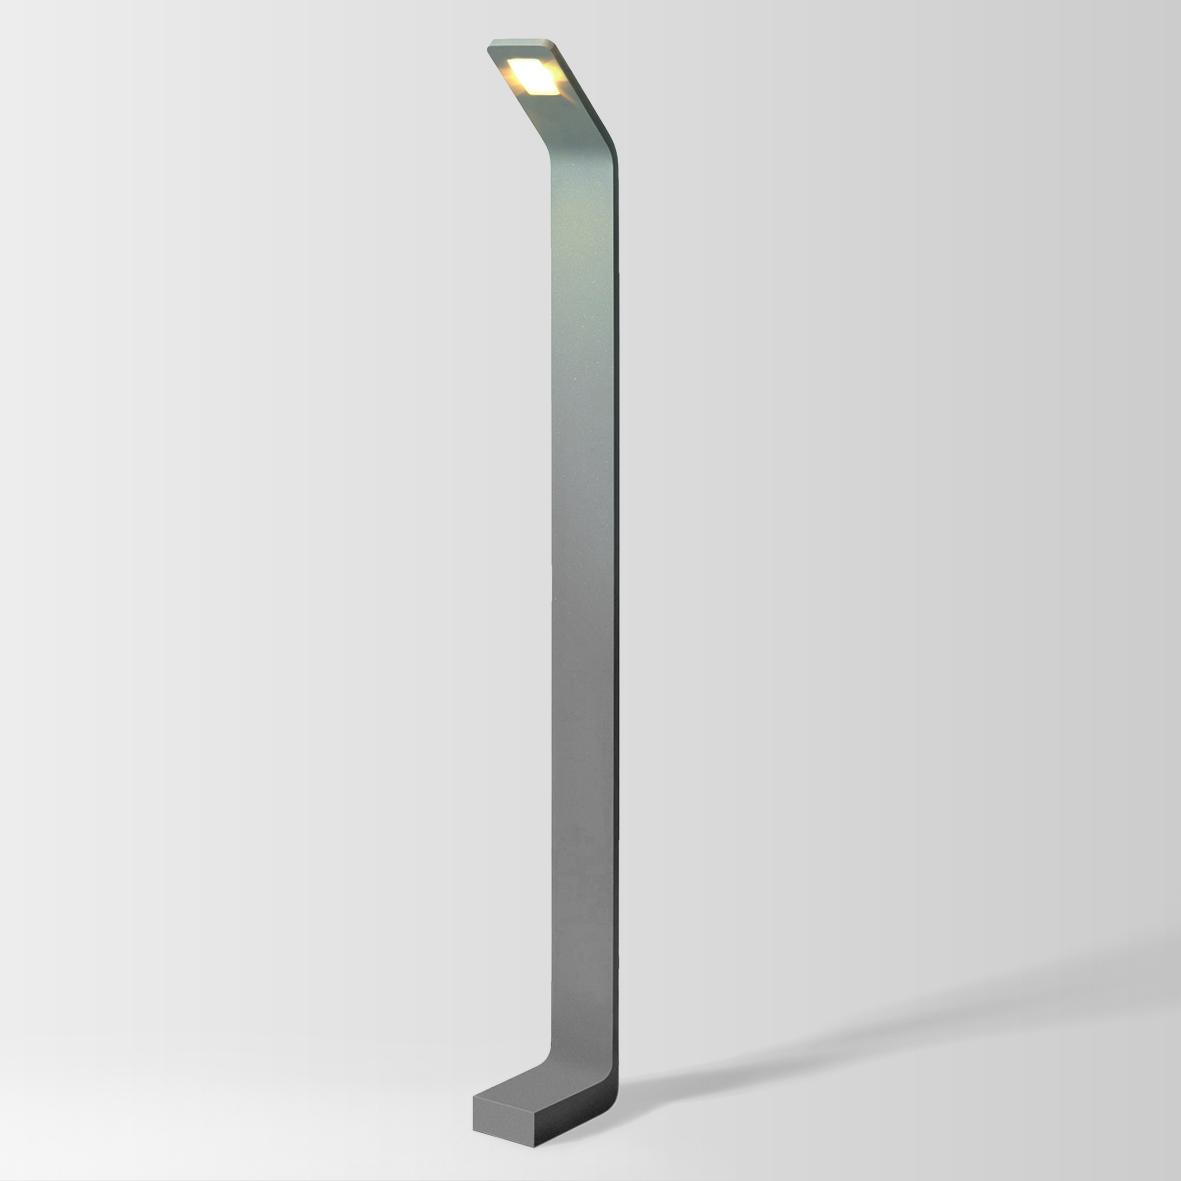 PACE 8.0 LED 3000K DIM tumehall 8W 80CRI 220-240VAC, välisvagusti pollar